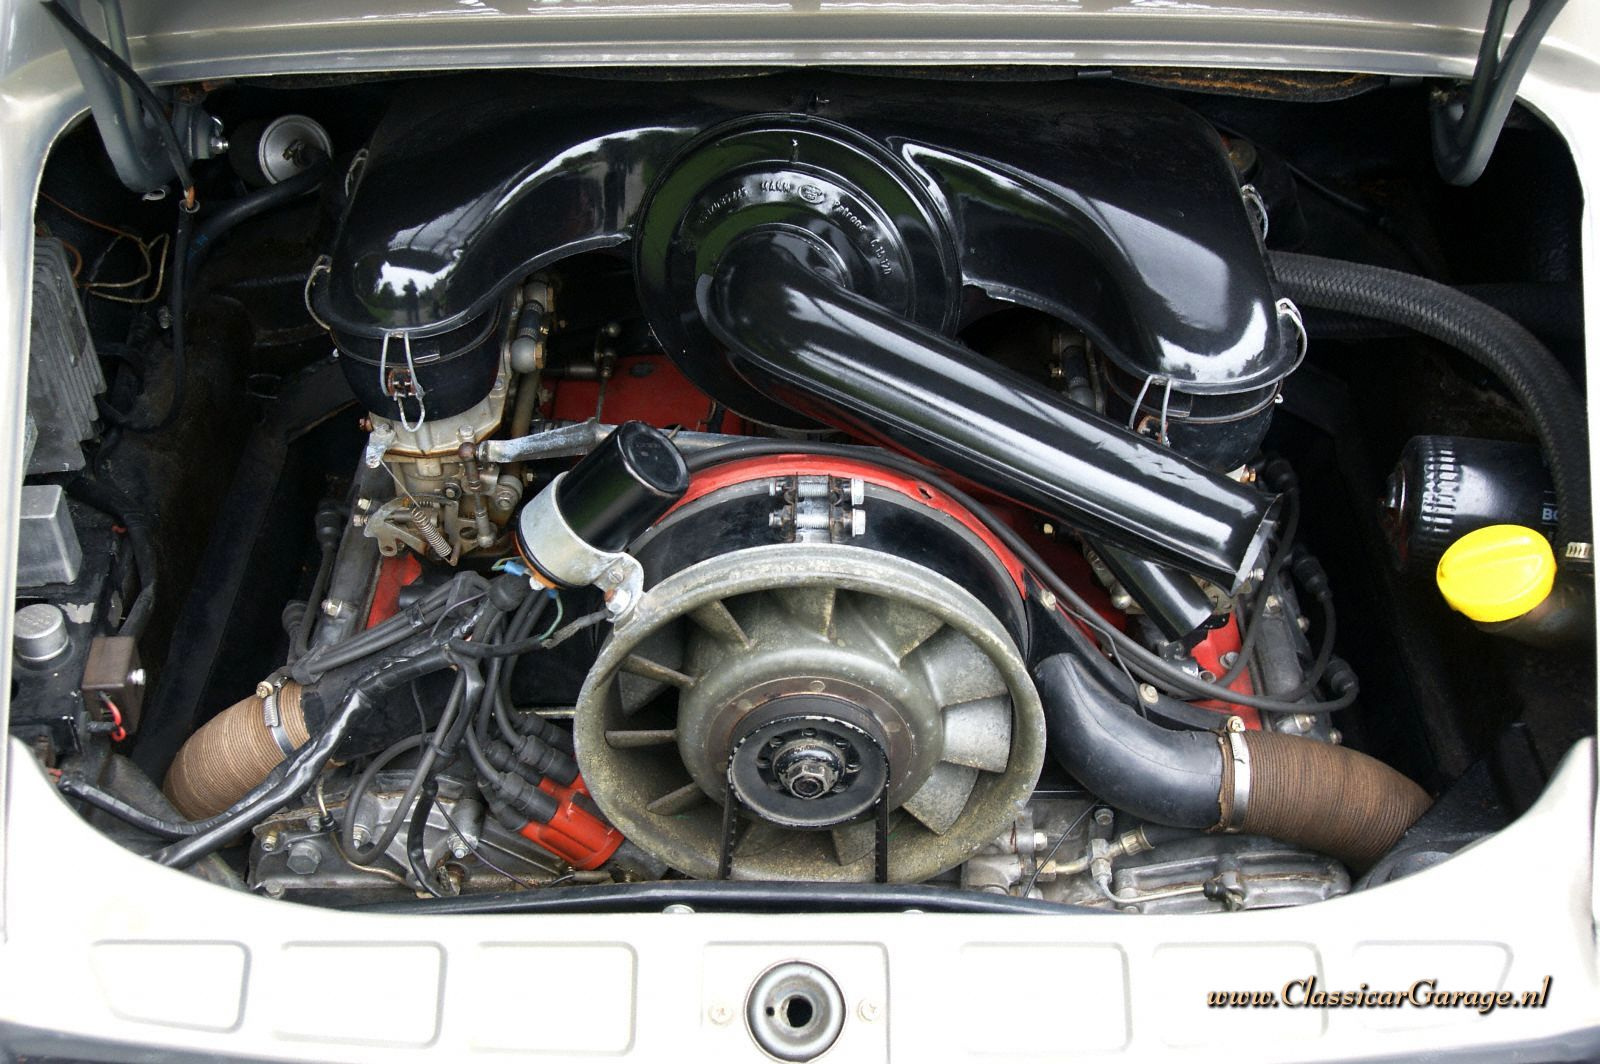 porsche 911 headlight wiring diagram fender jaguar hh wire best library harness 1973 headlights